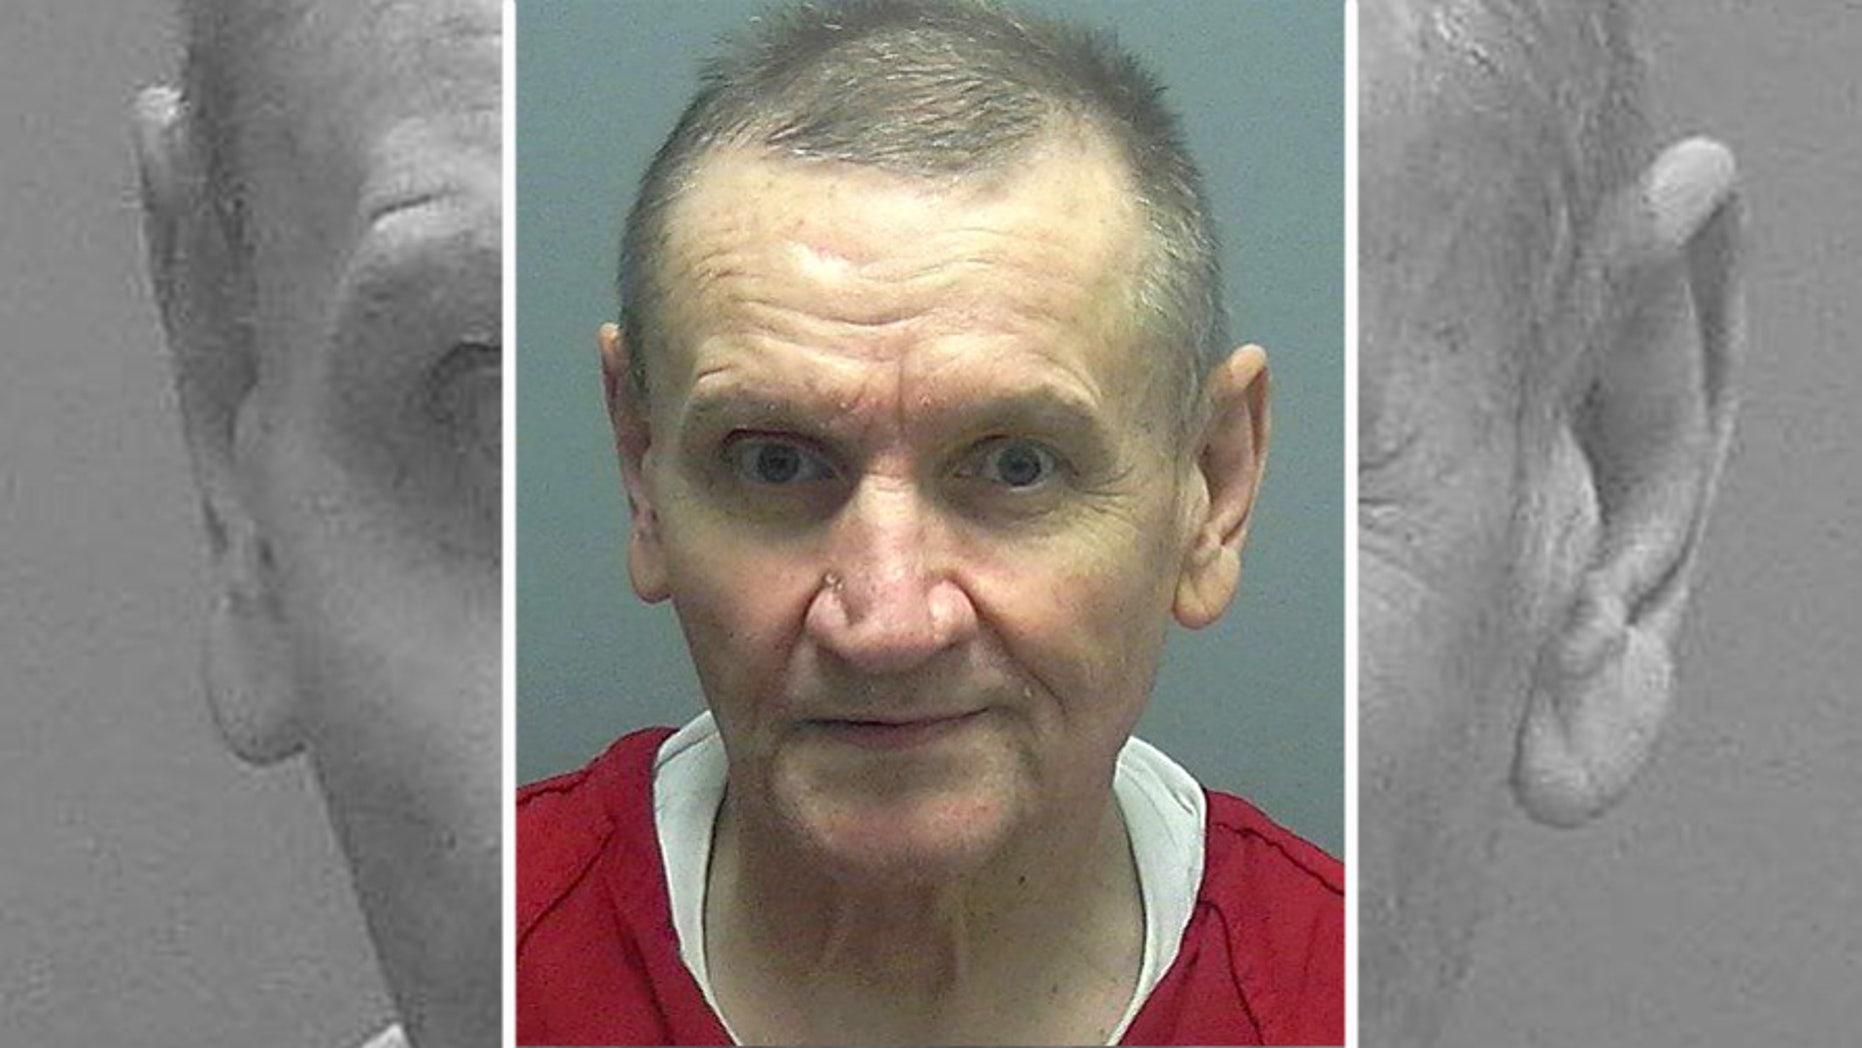 Ivan Bakh, 61, was arrested for allegedly firing a gun inside his Florida apartment.